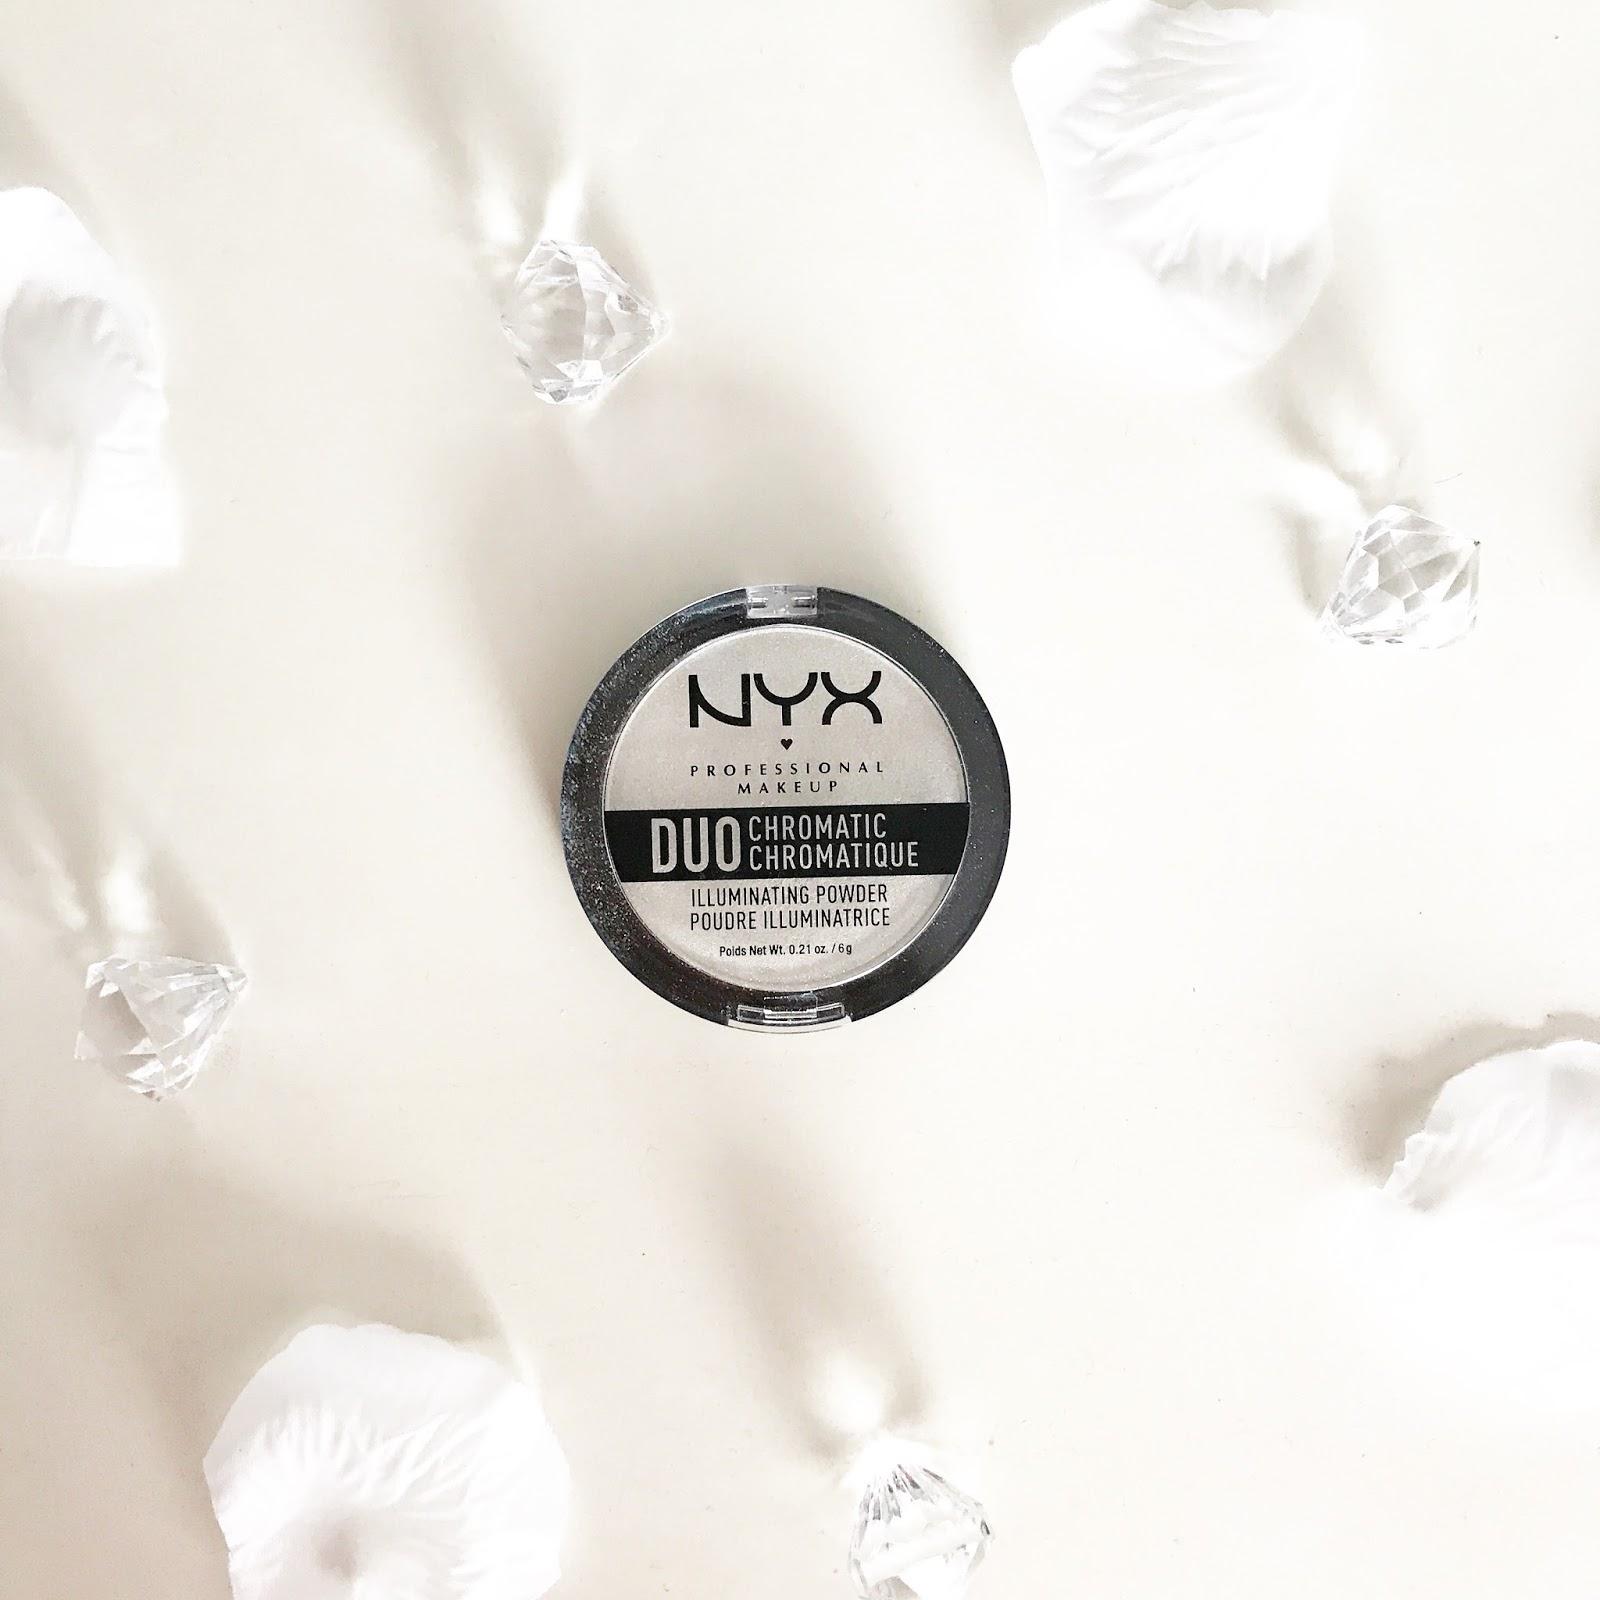 NYX Twilight Tint Duo Chromatic Illuminating Powder Review